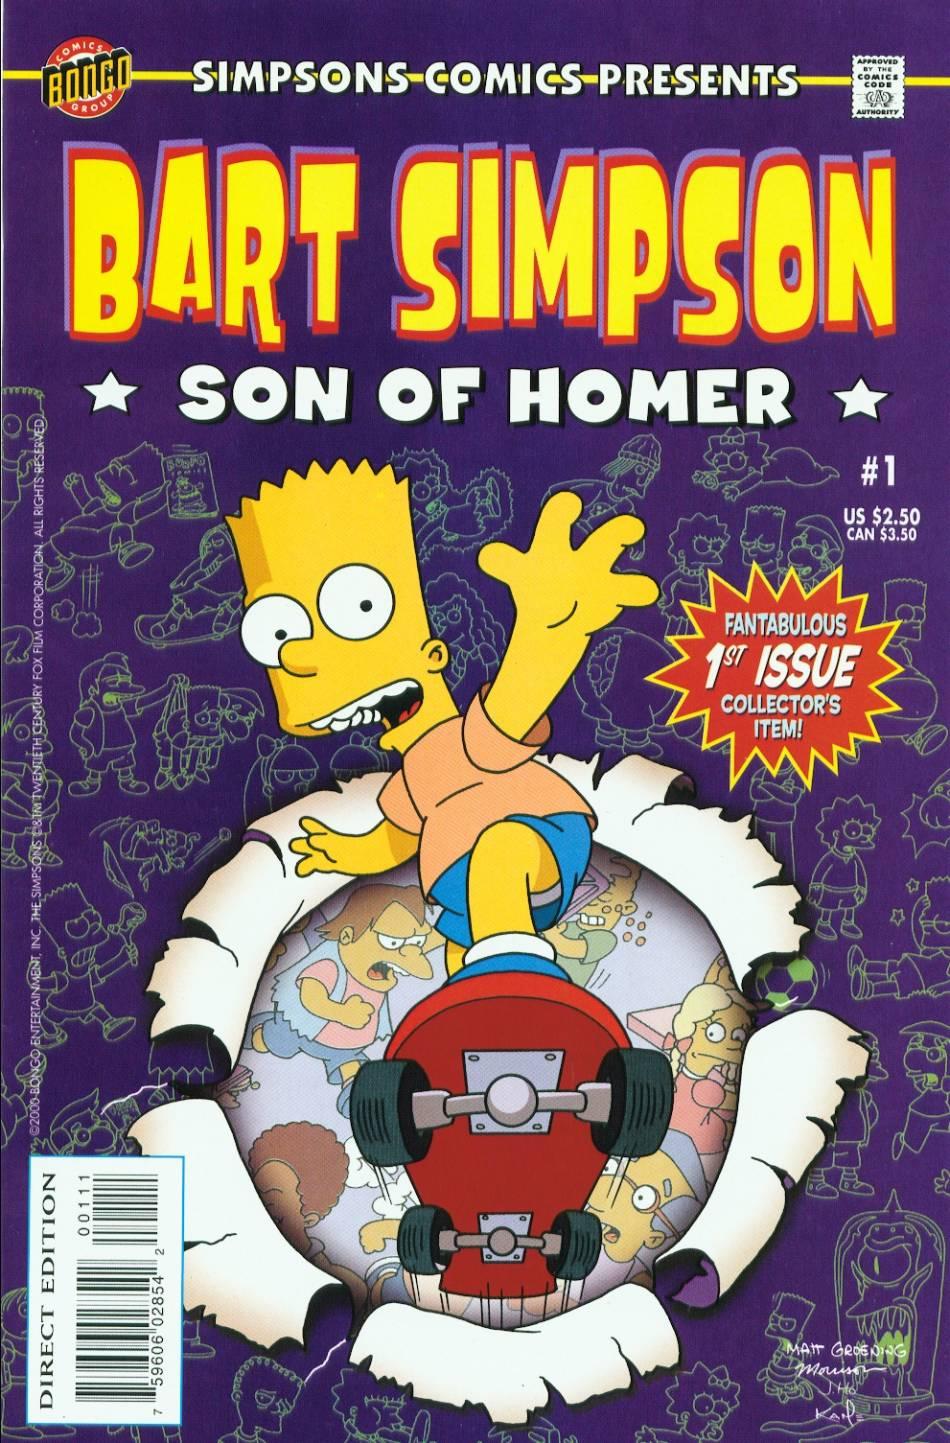 Read online Simpsons Comics Presents Bart Simpson comic -  Issue #1 - 1